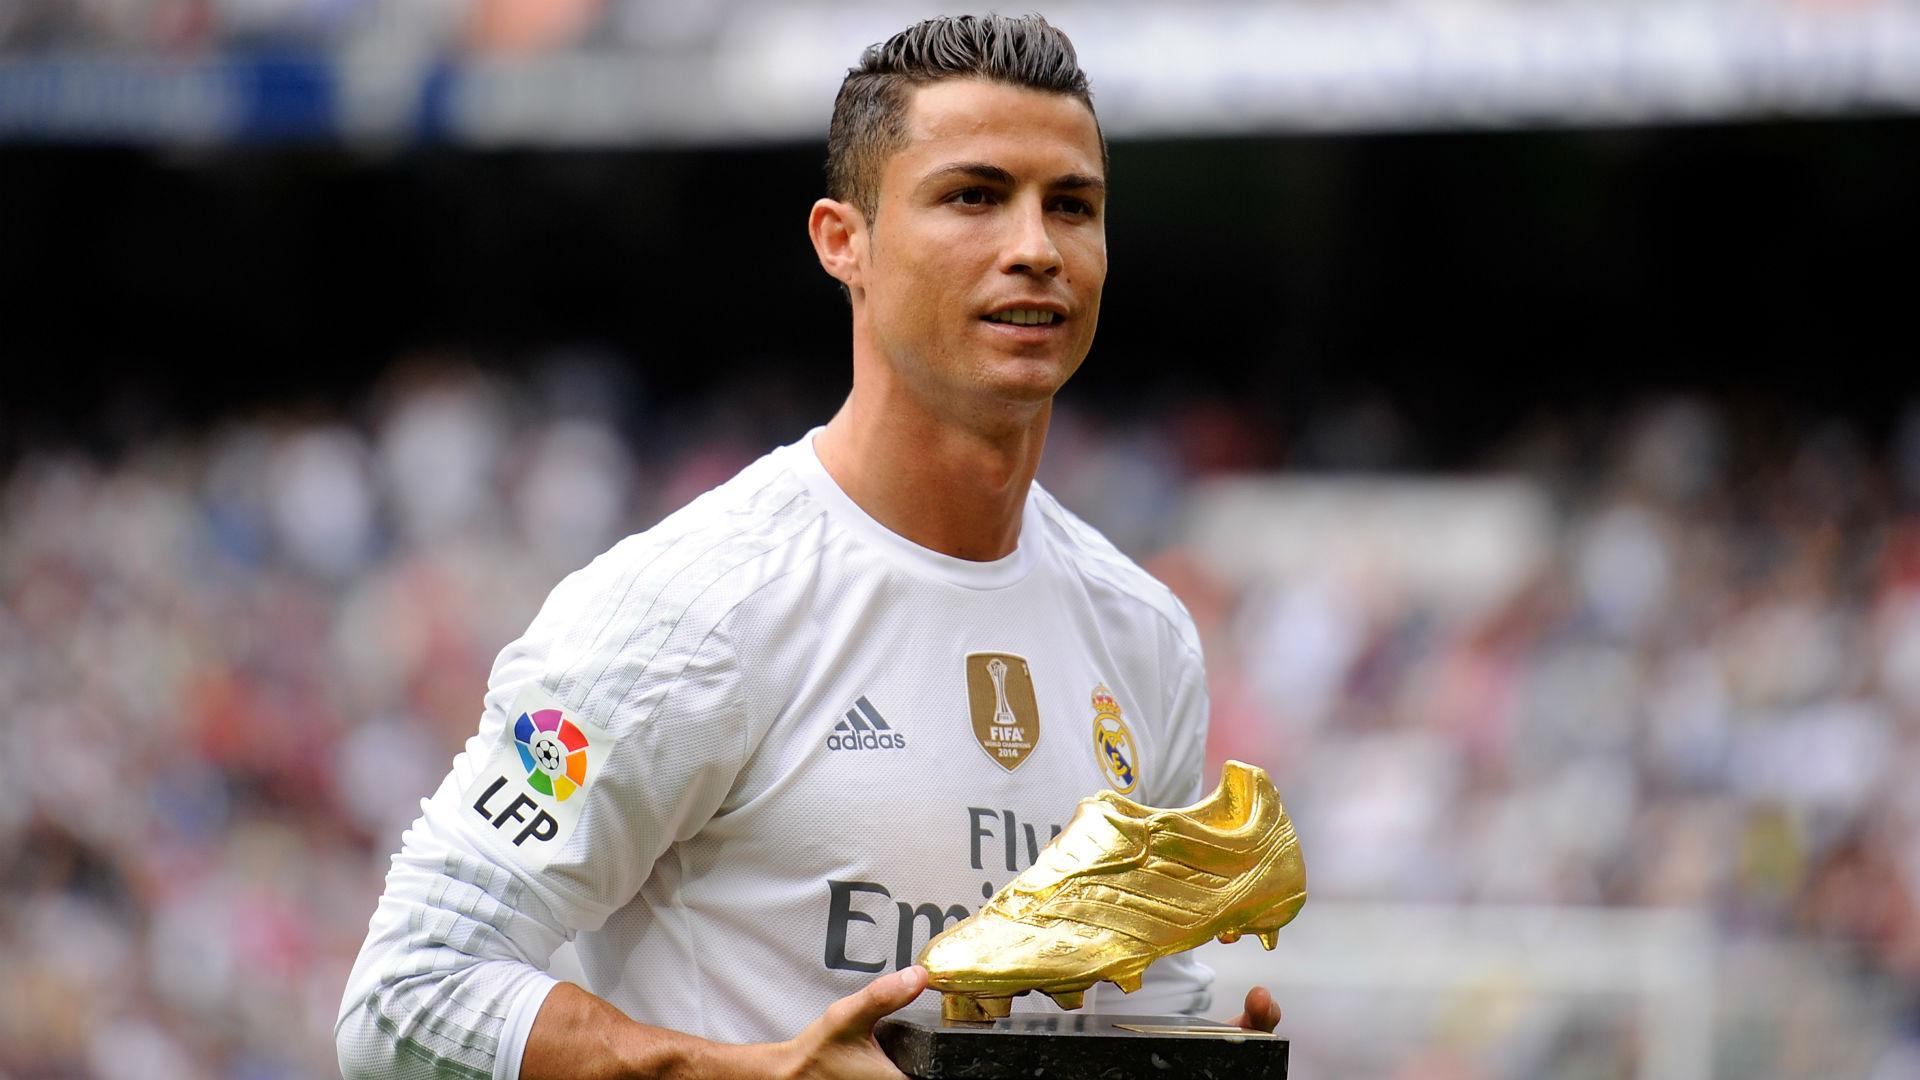 Cristiano Ronaldo Golden Shoe